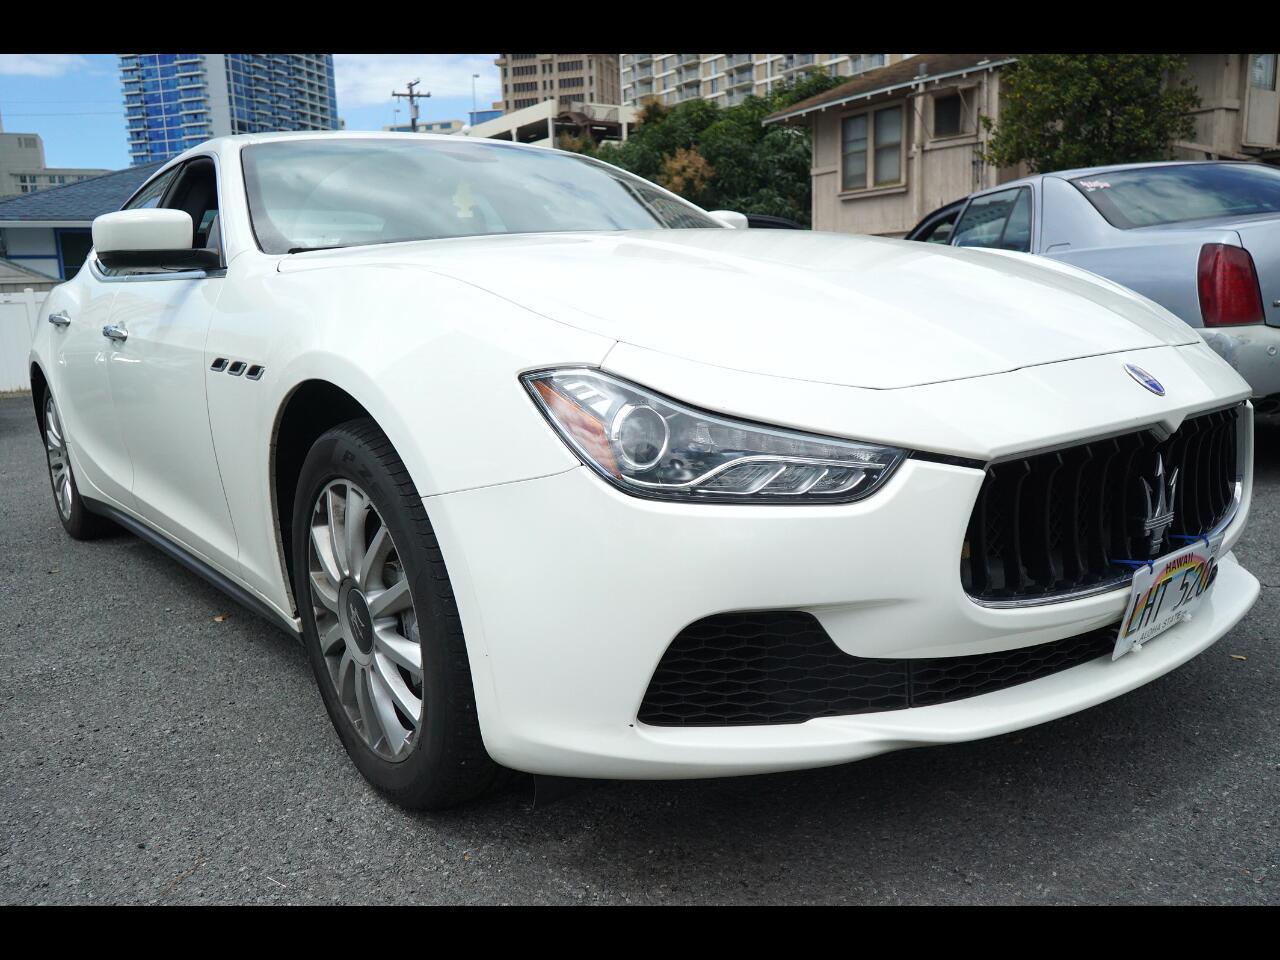 2014 Maserati Ghibli 4dr Sdn